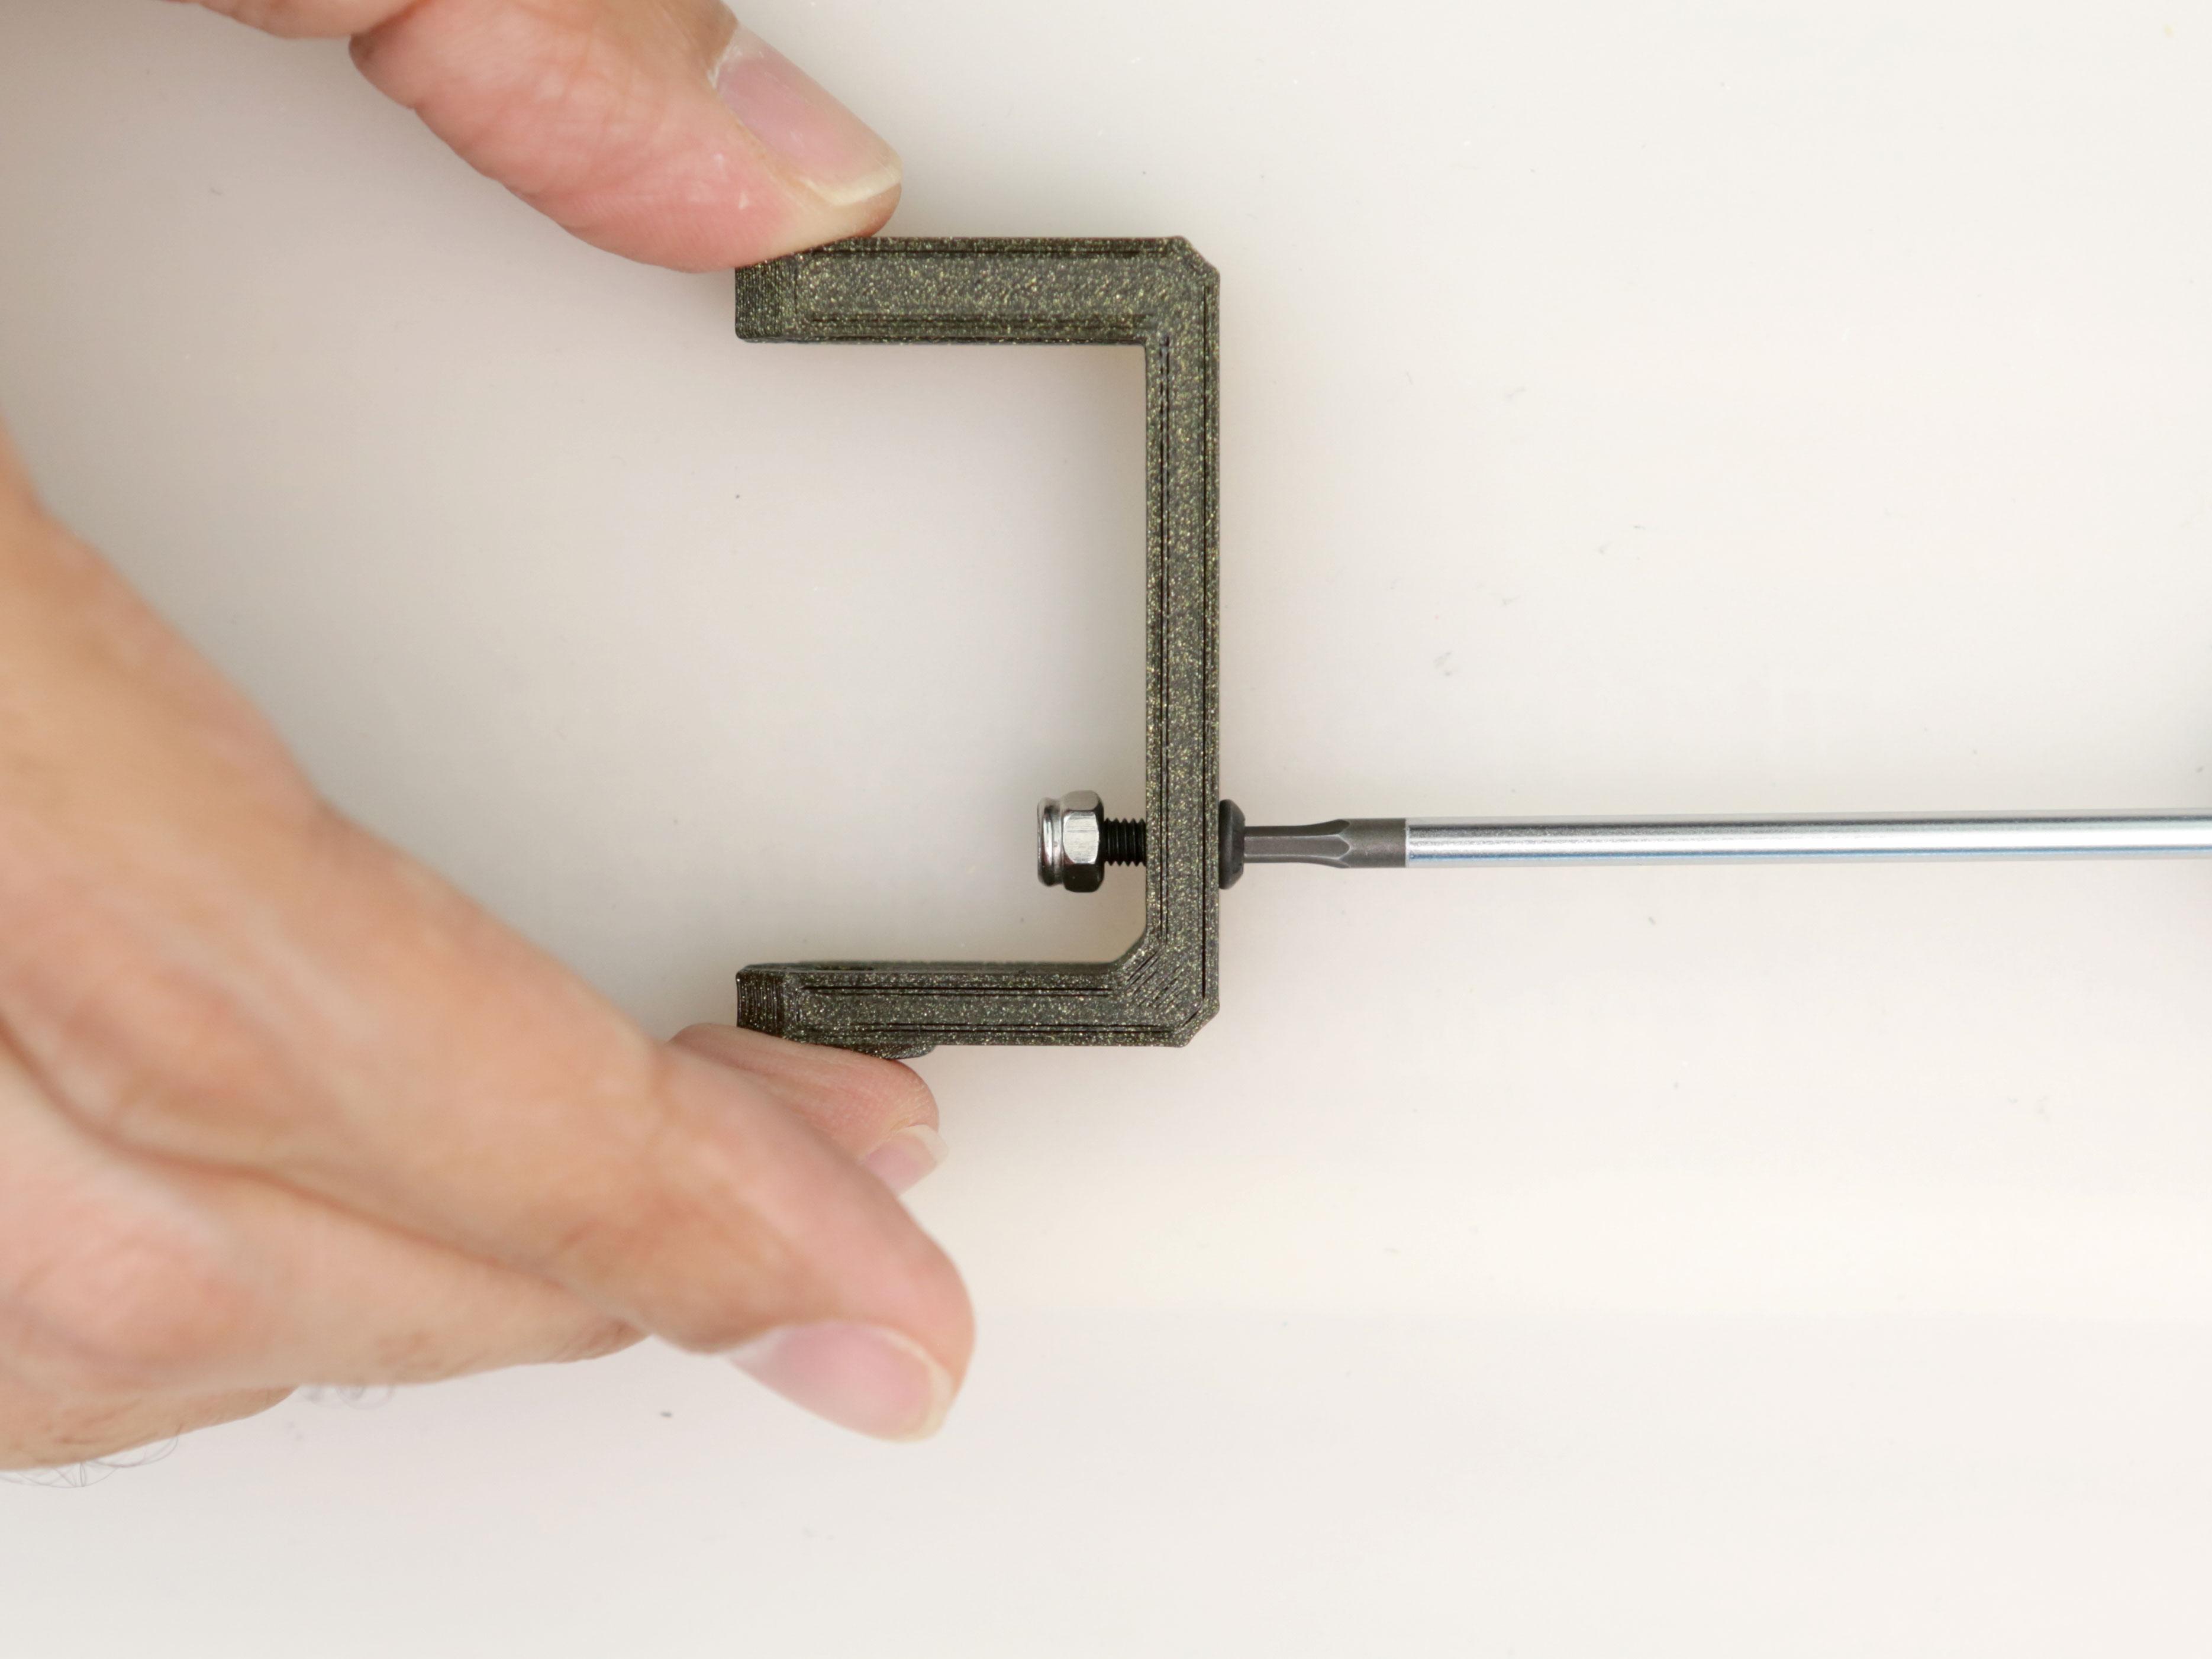 3d_printing_servo-arm-screw.jpg